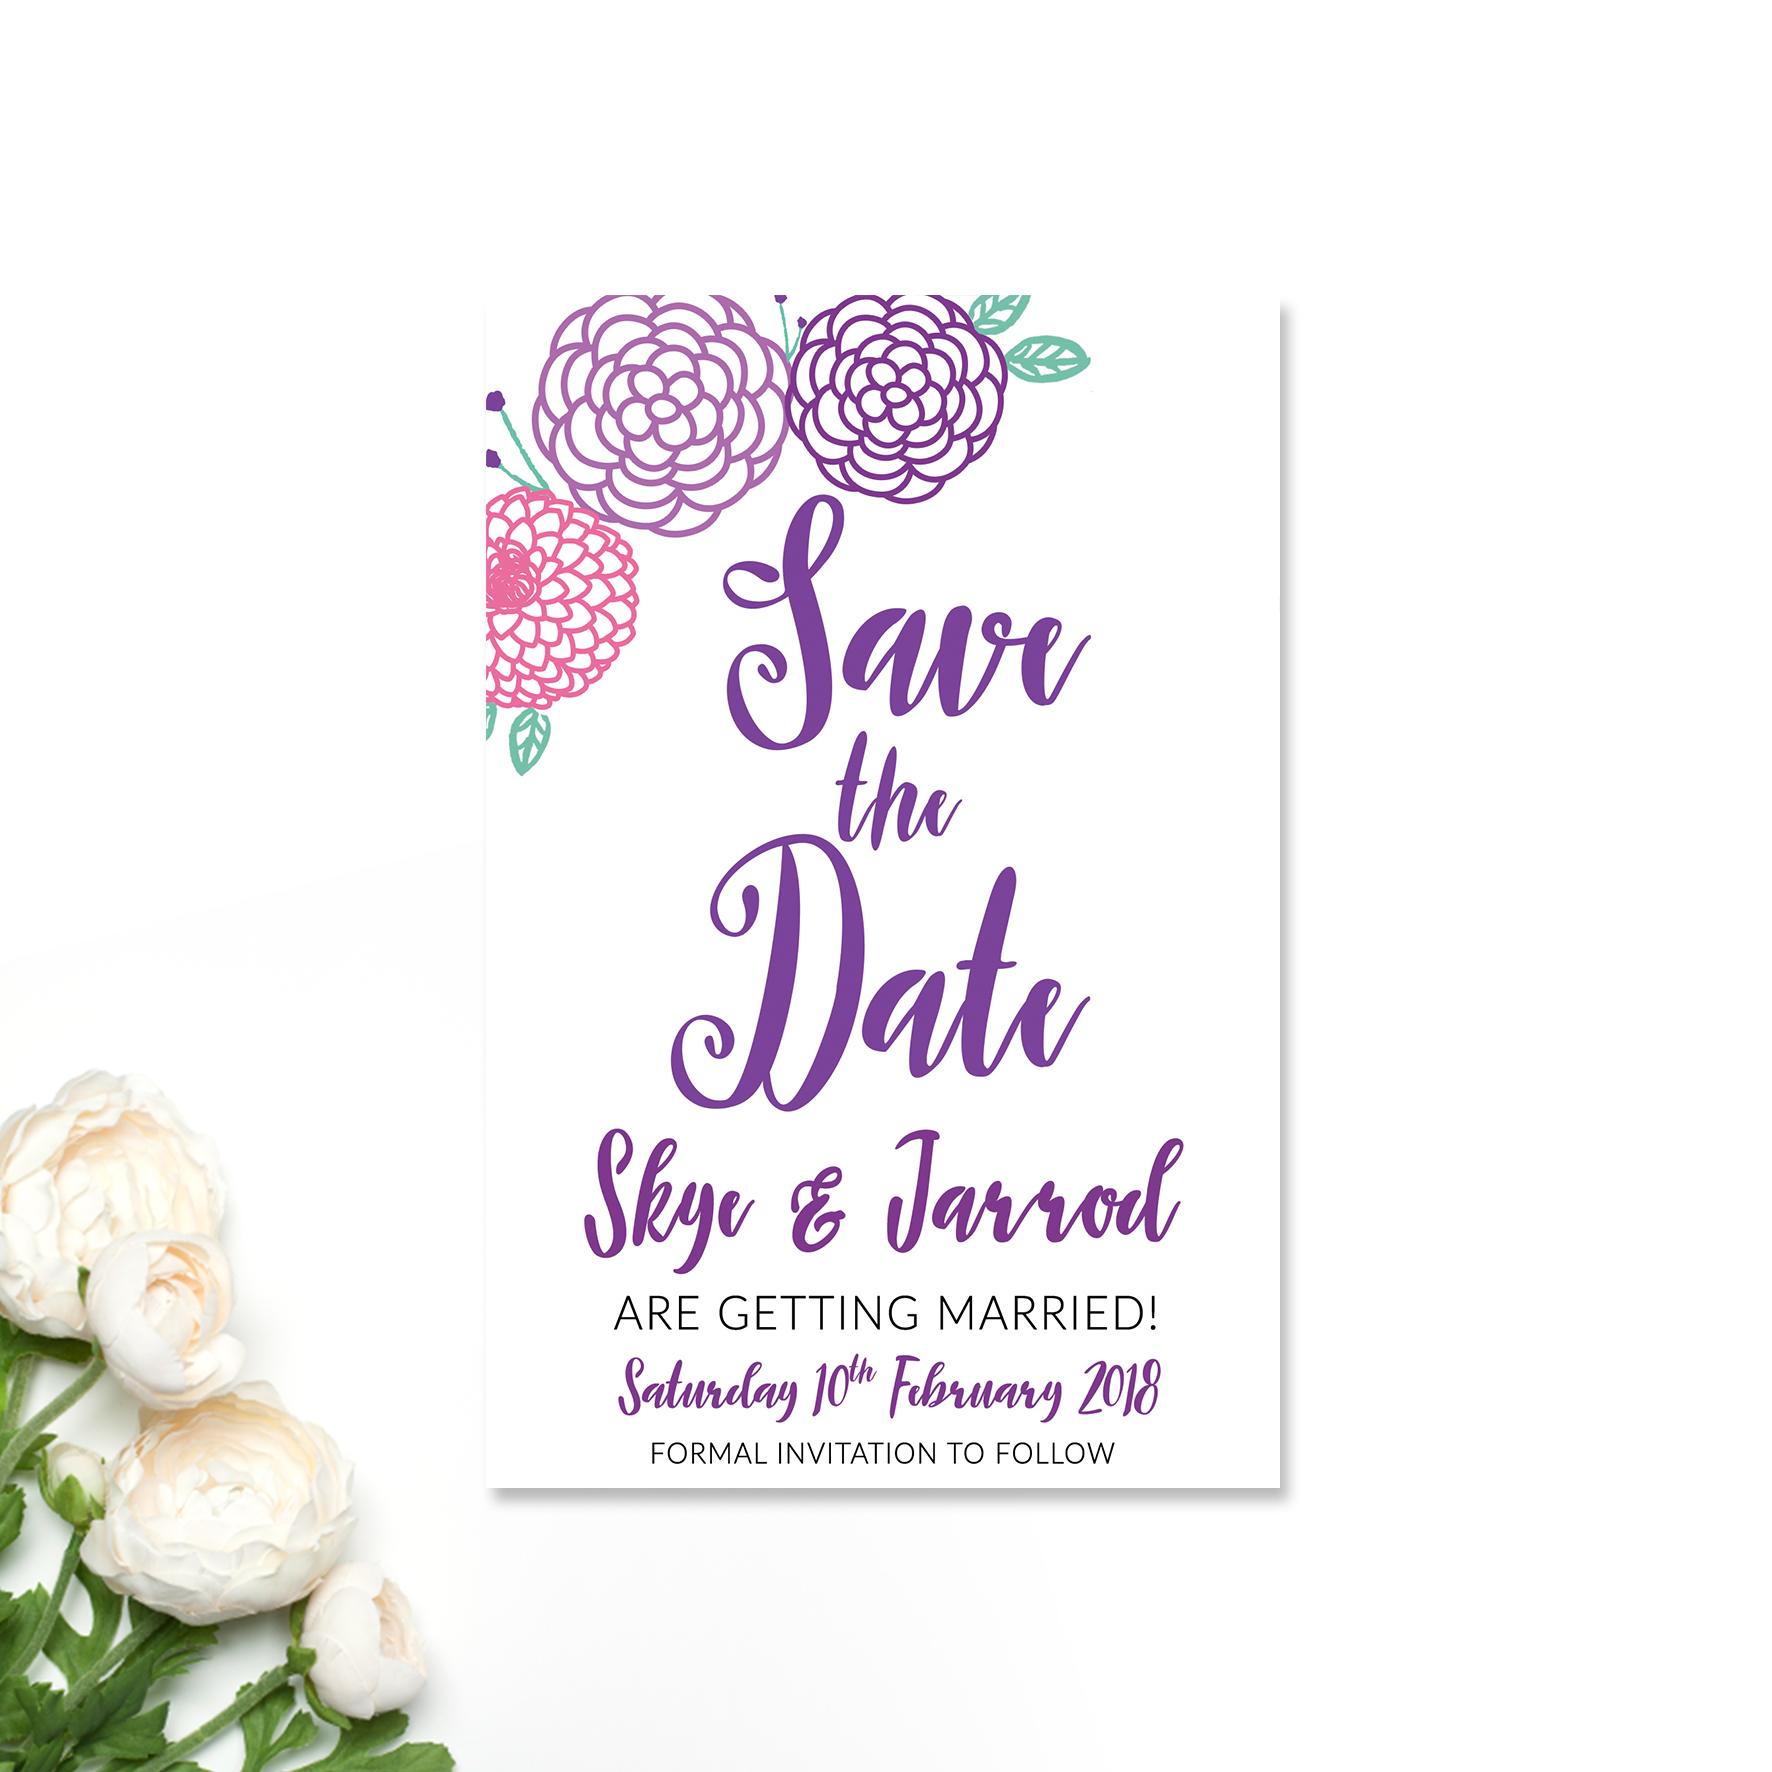 Skye + Jarrod Save the Date Card